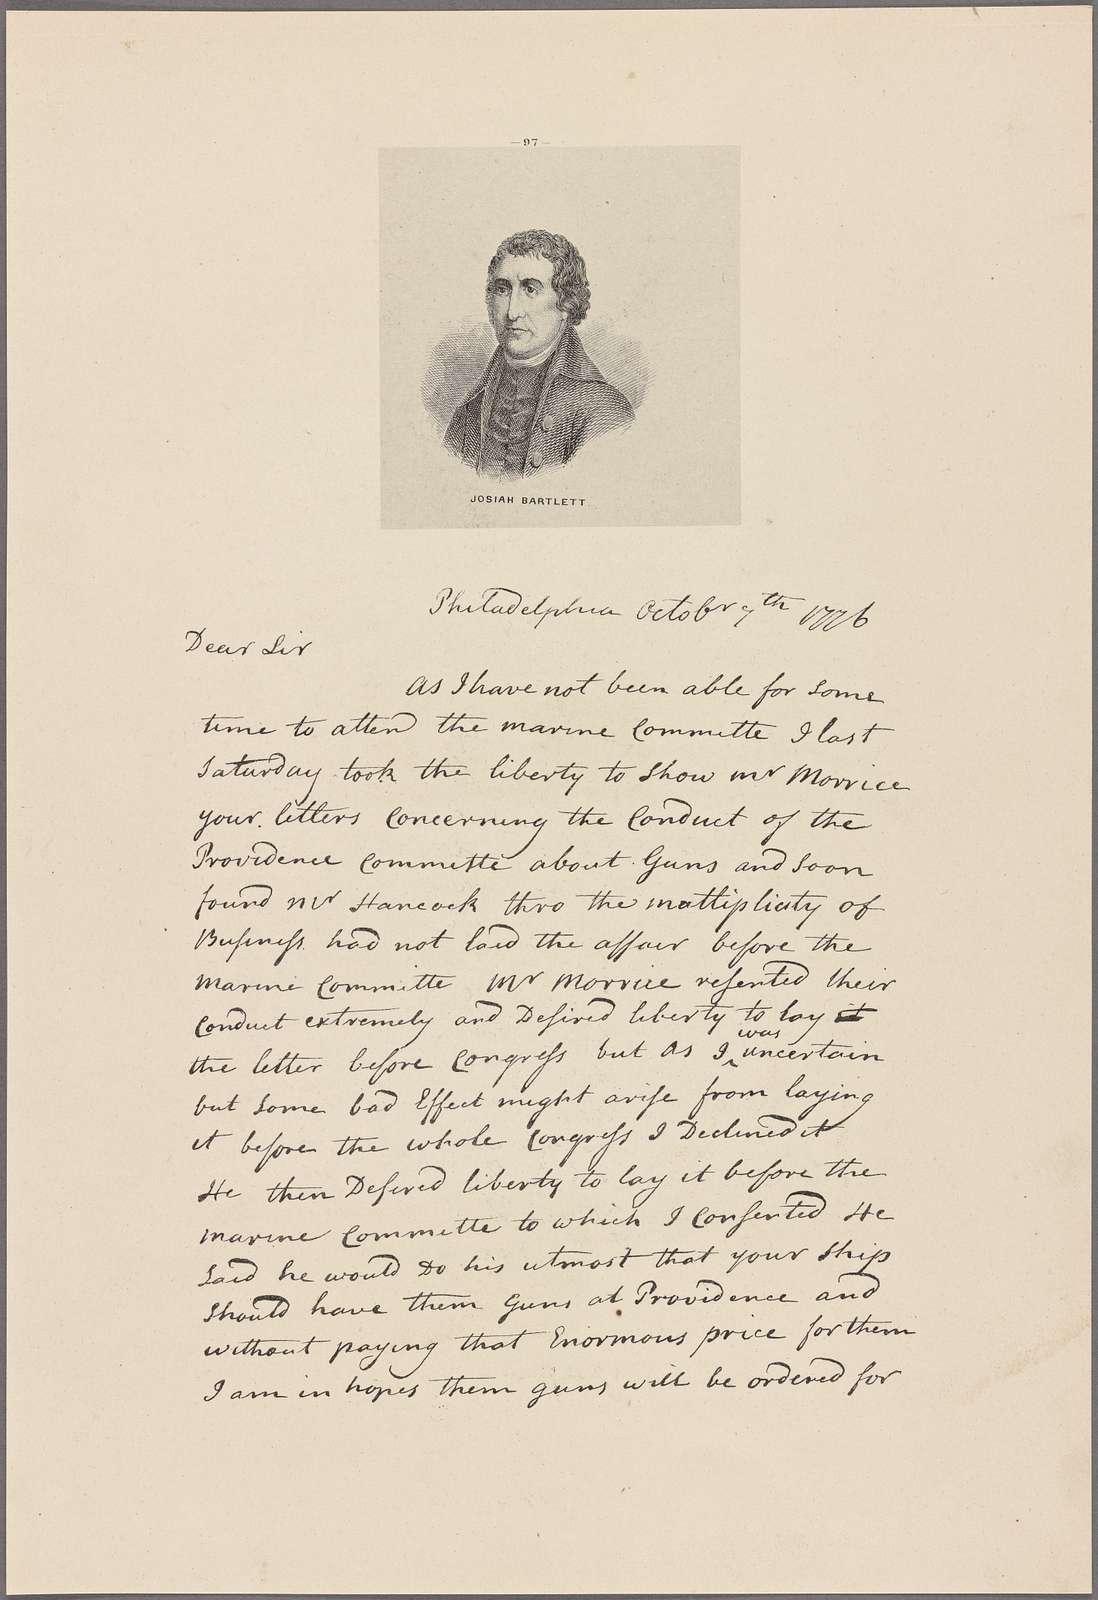 Letter to John Langdon [Portsmouth, N. H.]